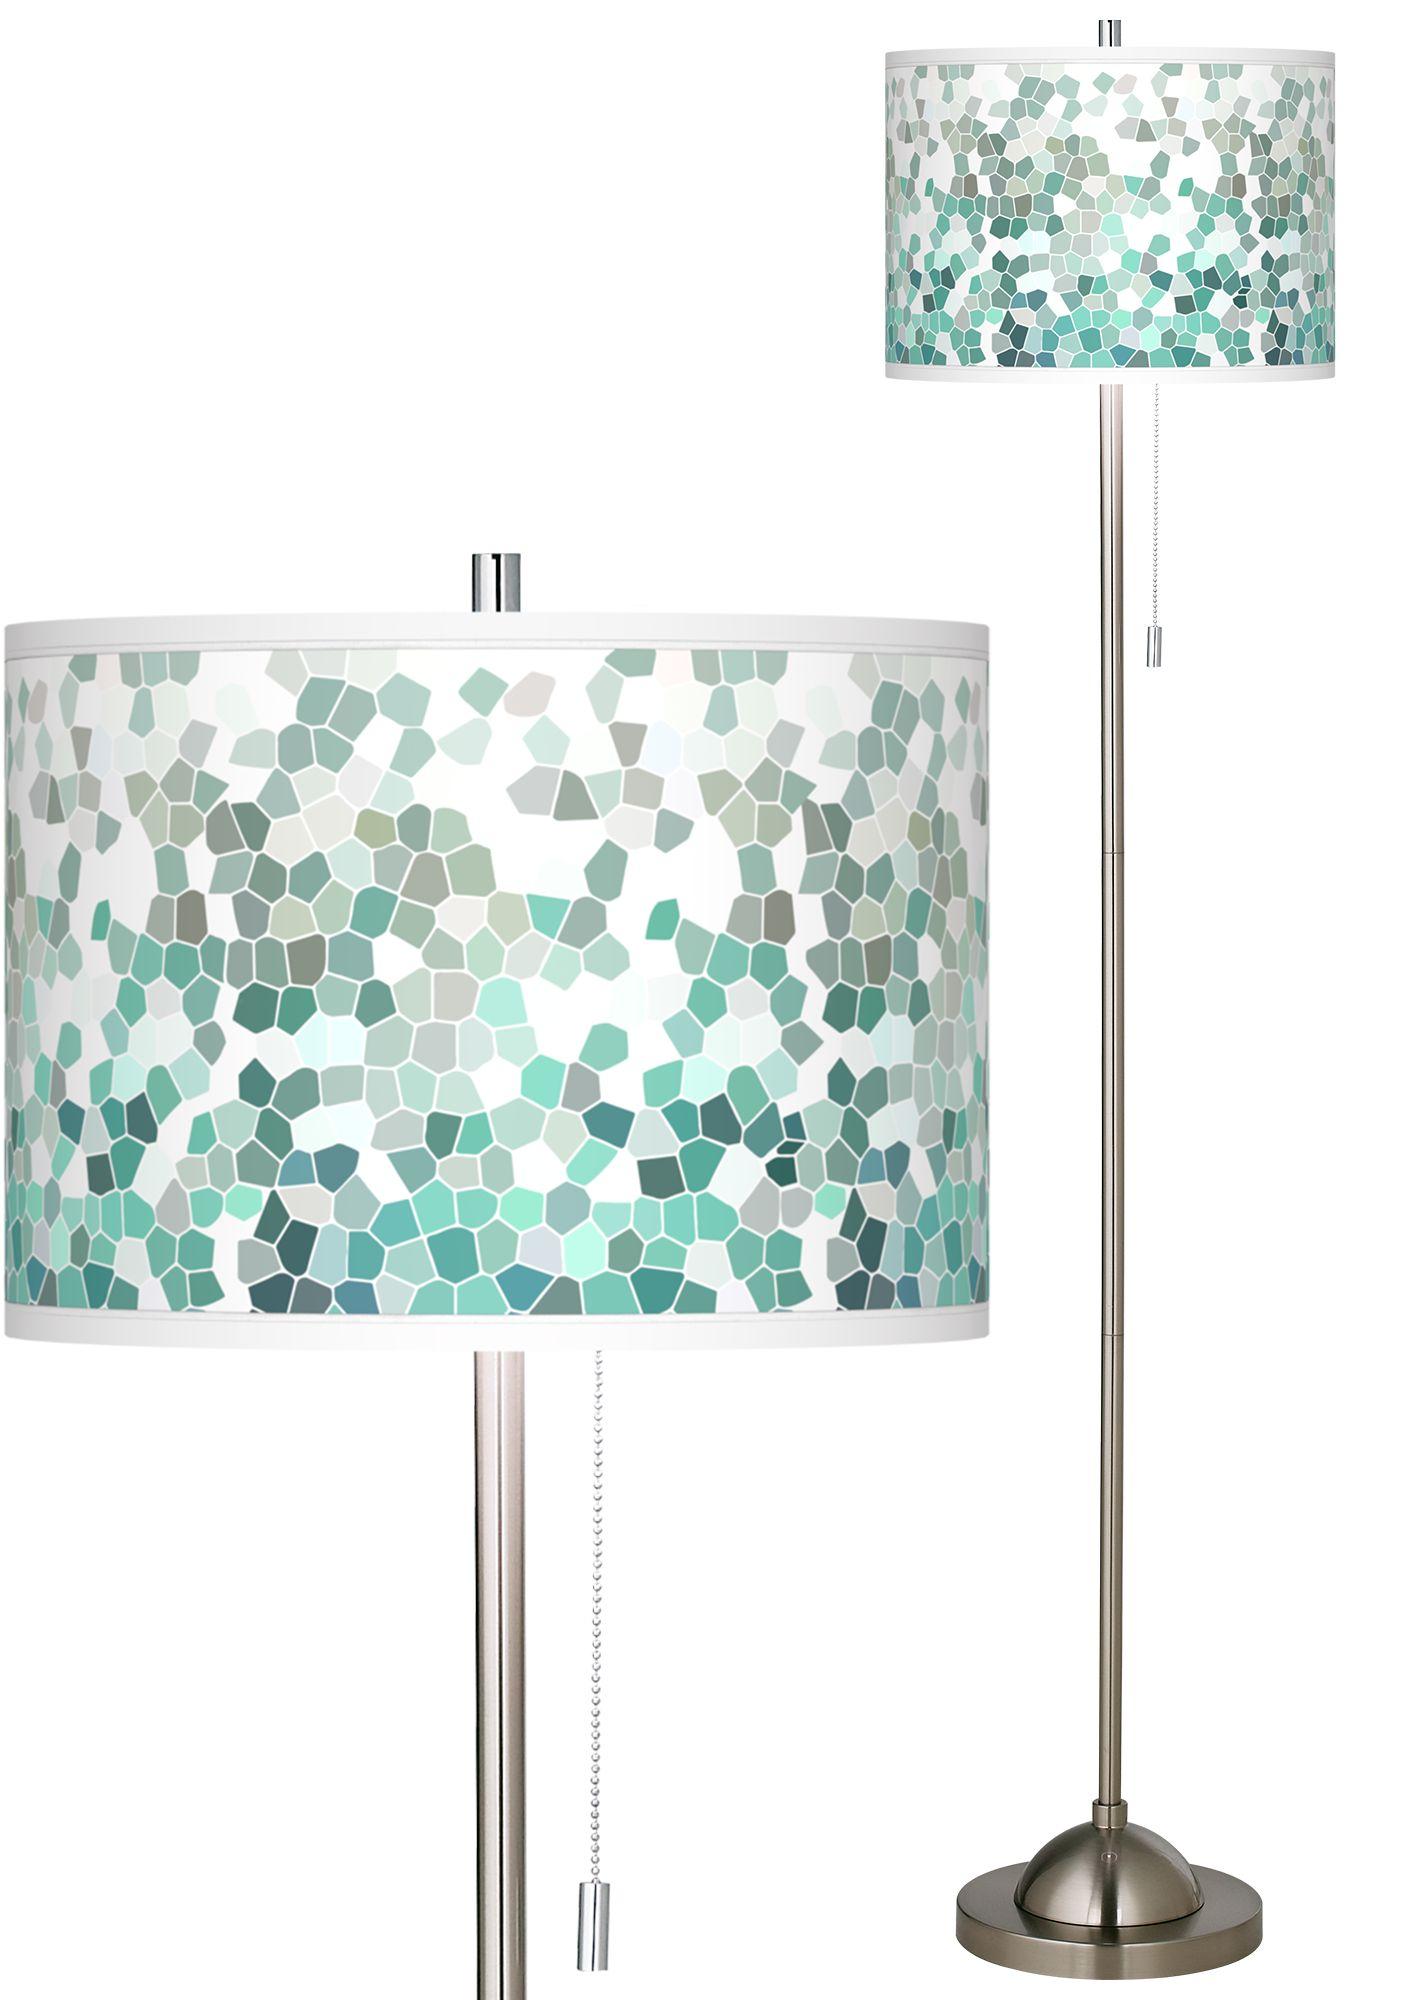 Captivating Aqua Mosaic Brushed Nickel Pull Chain Floor Lamp